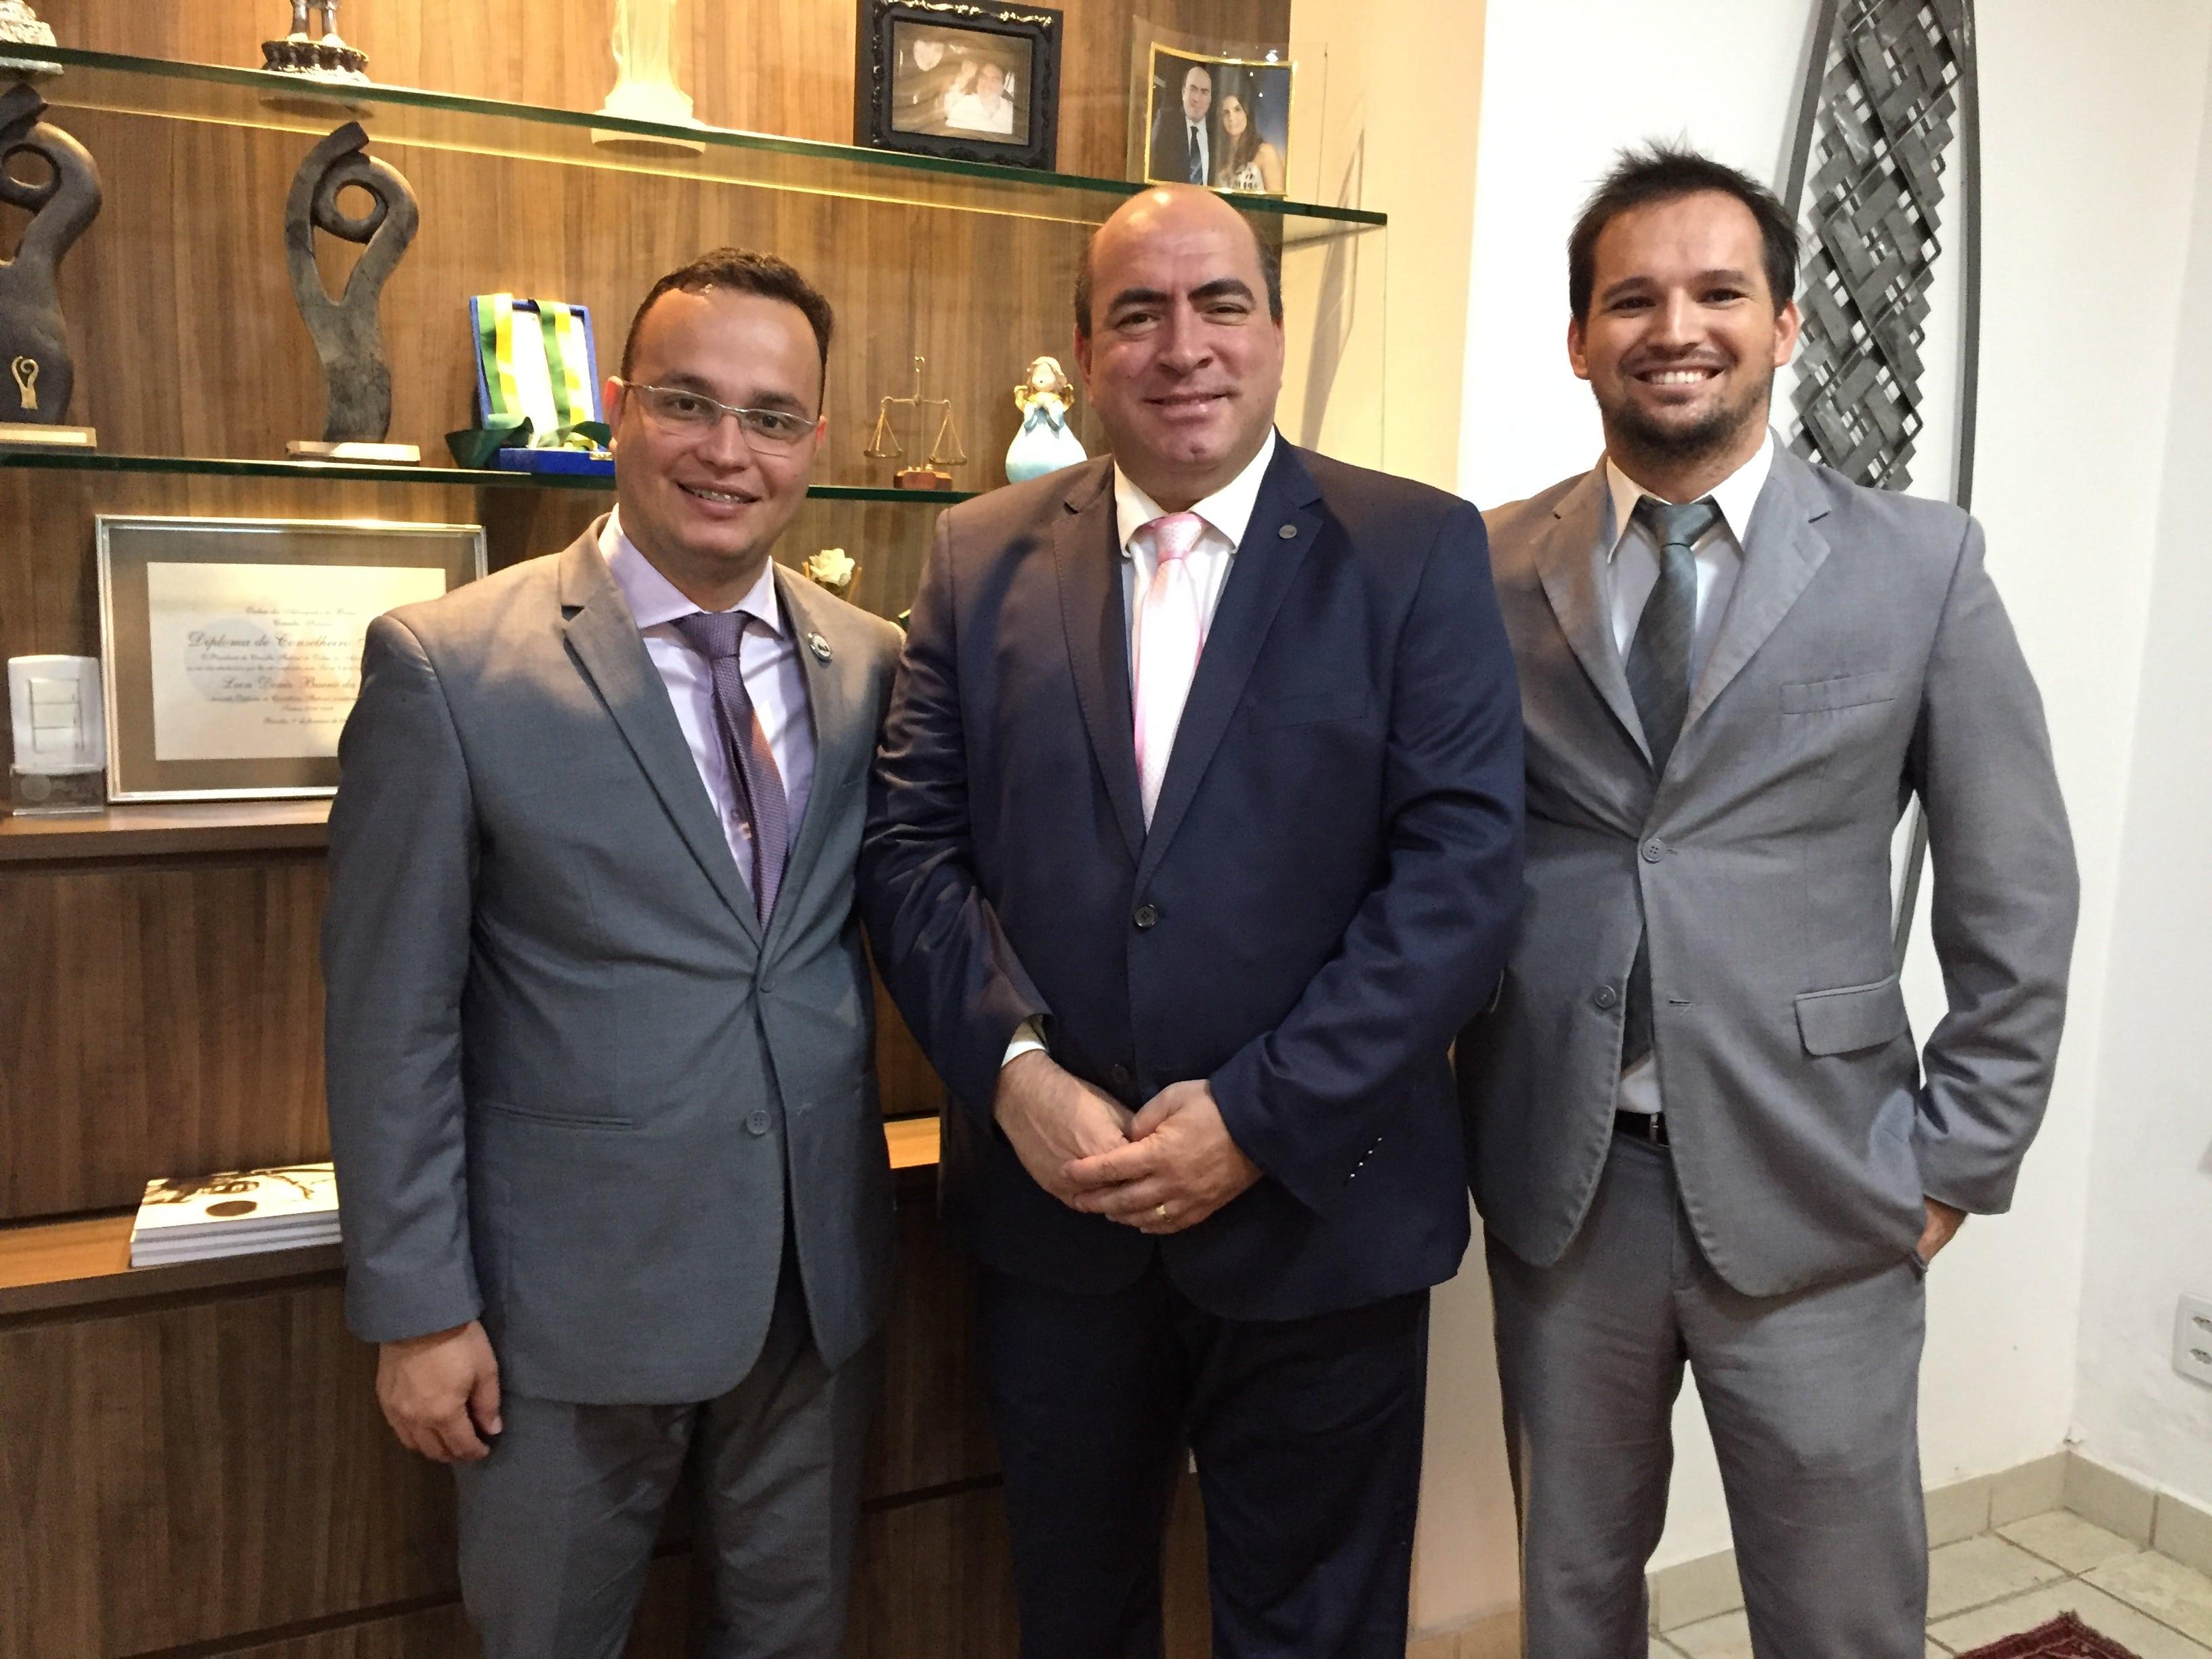 Amigos Dr. Leon Deniz Conselheiro Federal da OAB por Goiás e Dr. Max Paulo